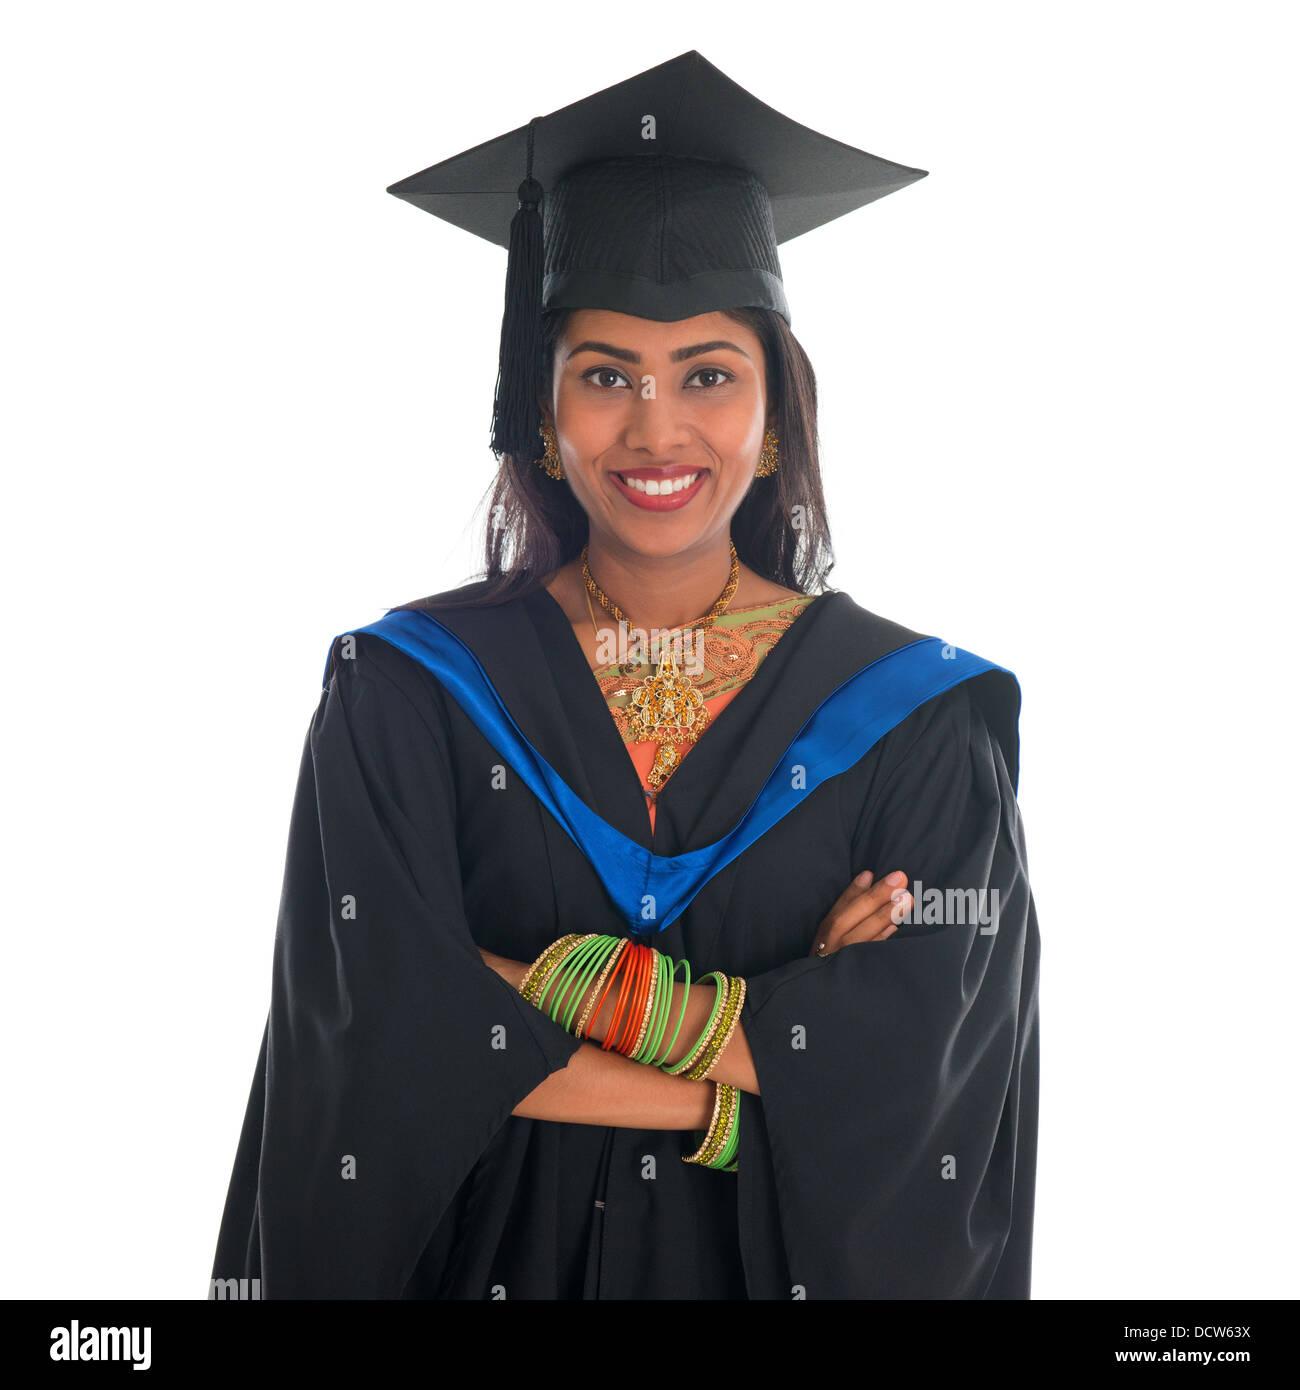 Graduation Gown India Stock Photos & Graduation Gown India Stock ...